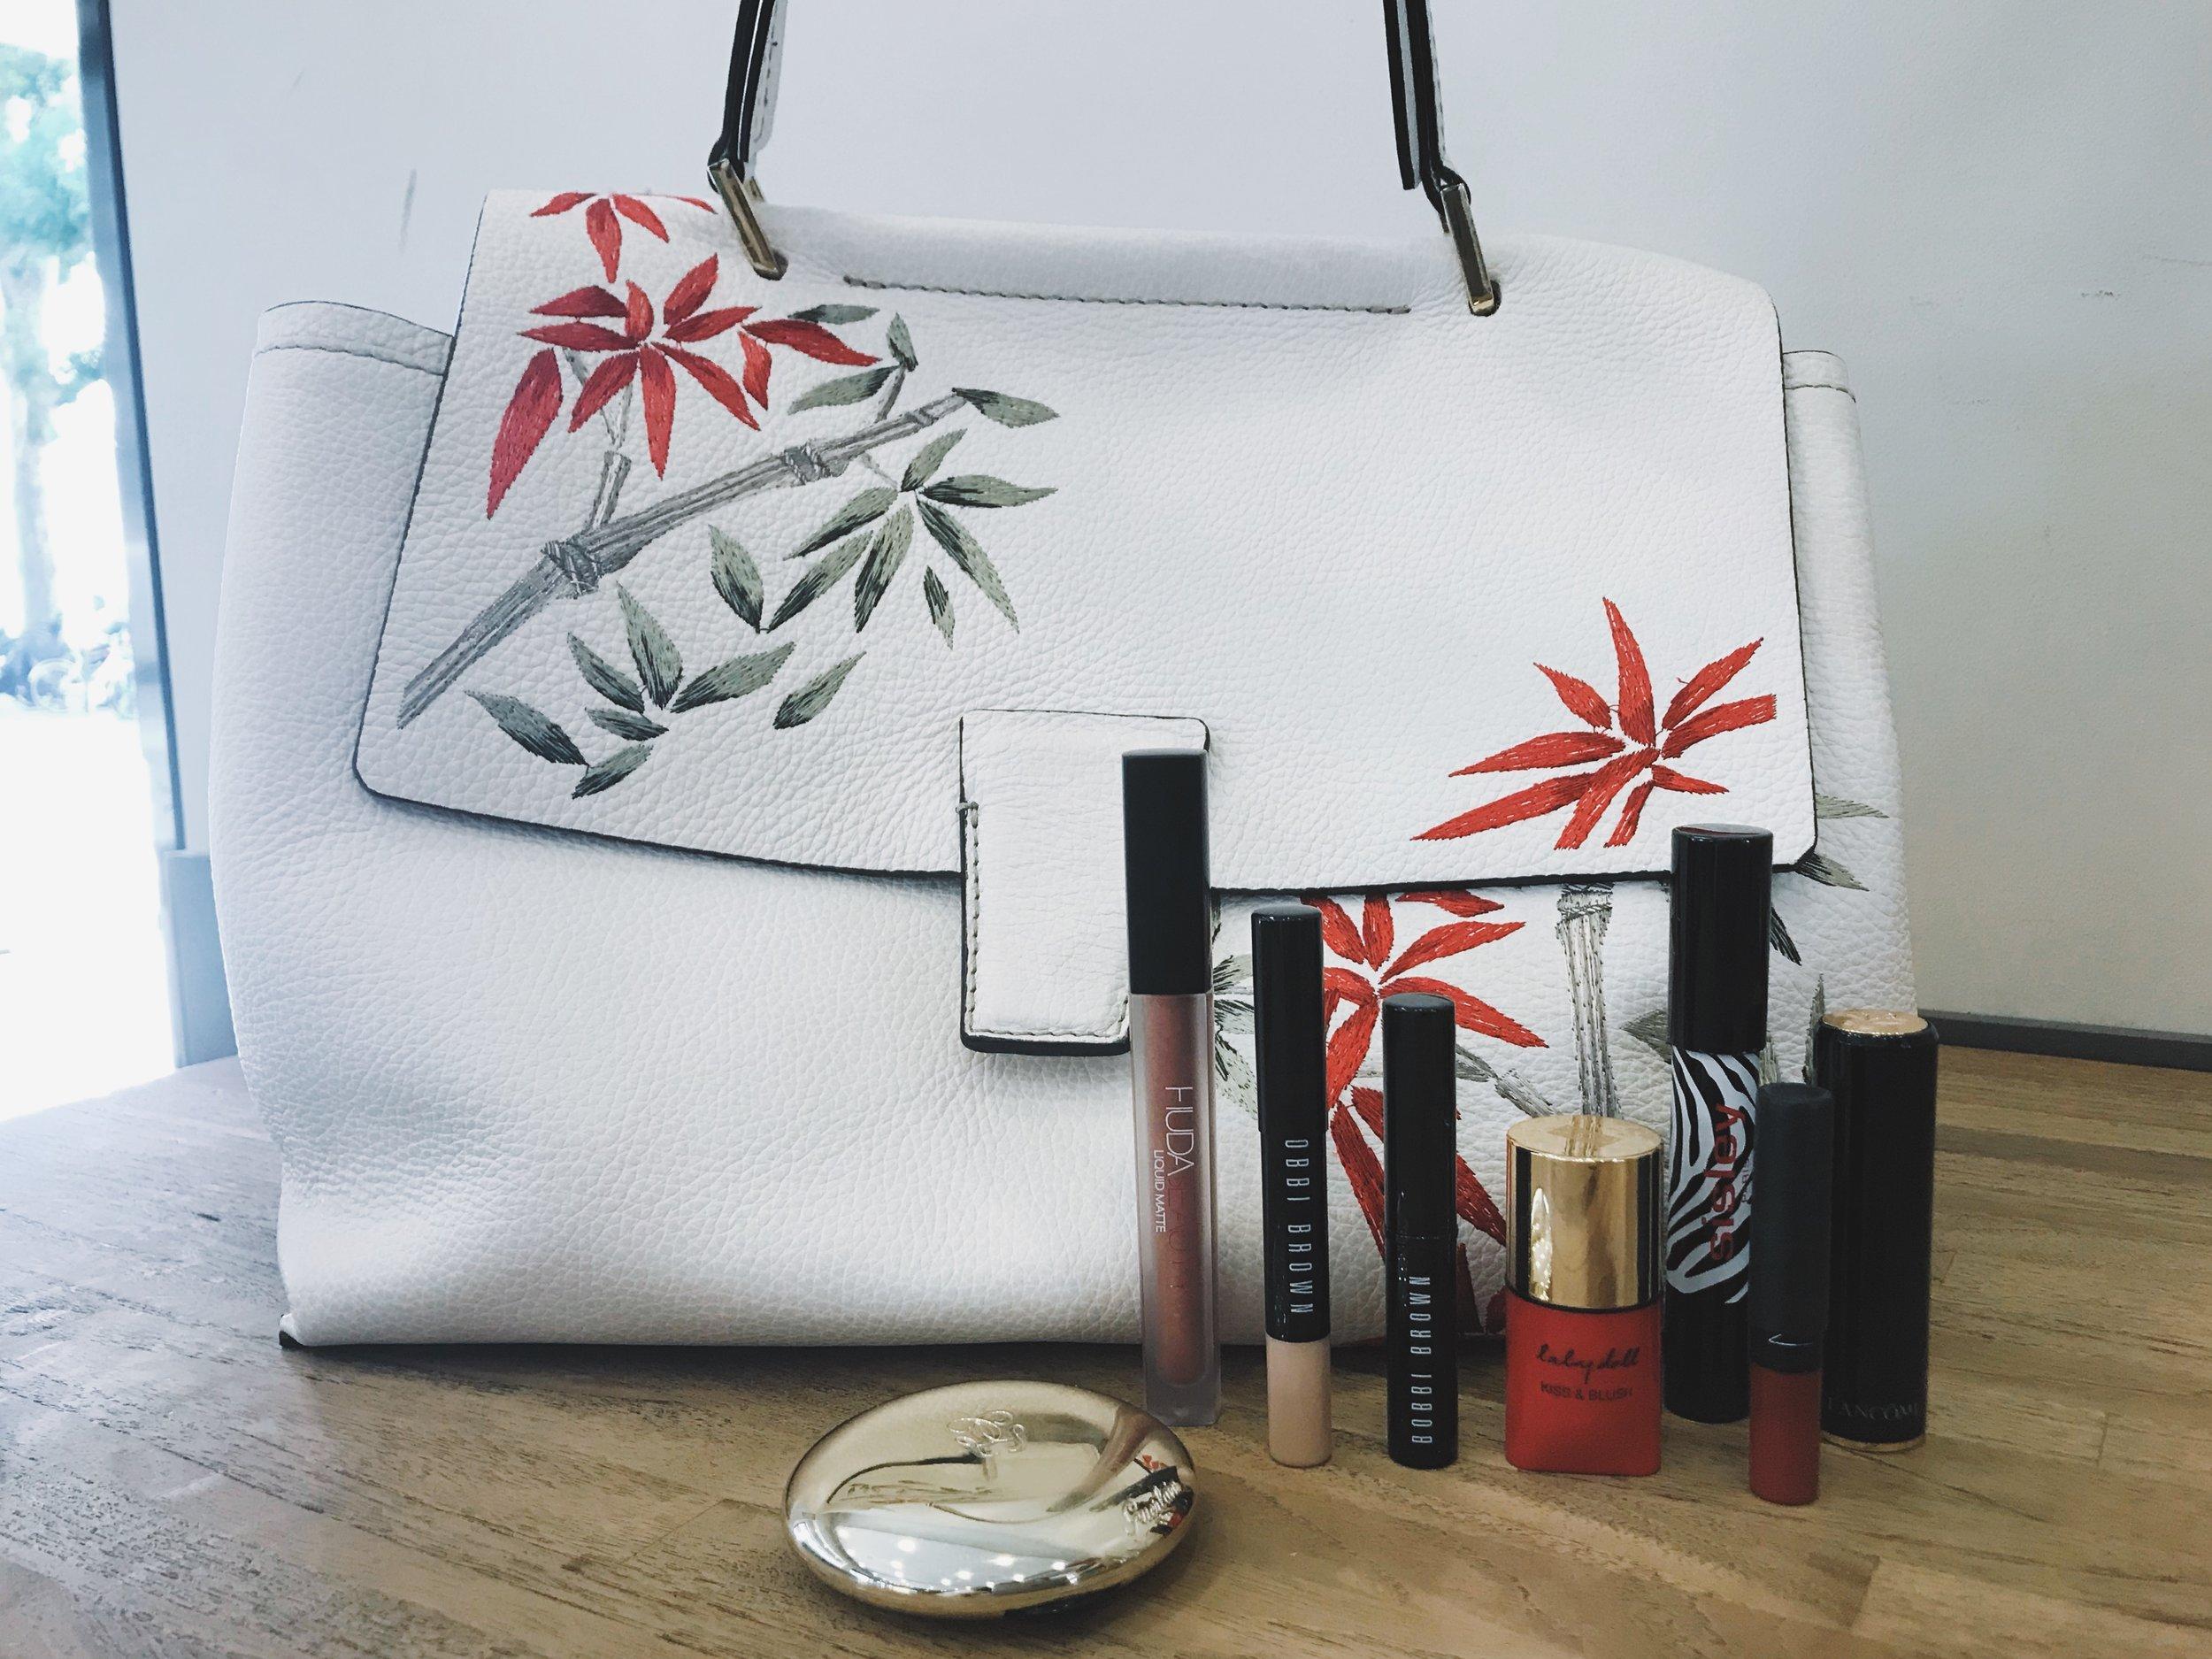 makeup in my bag.JPG